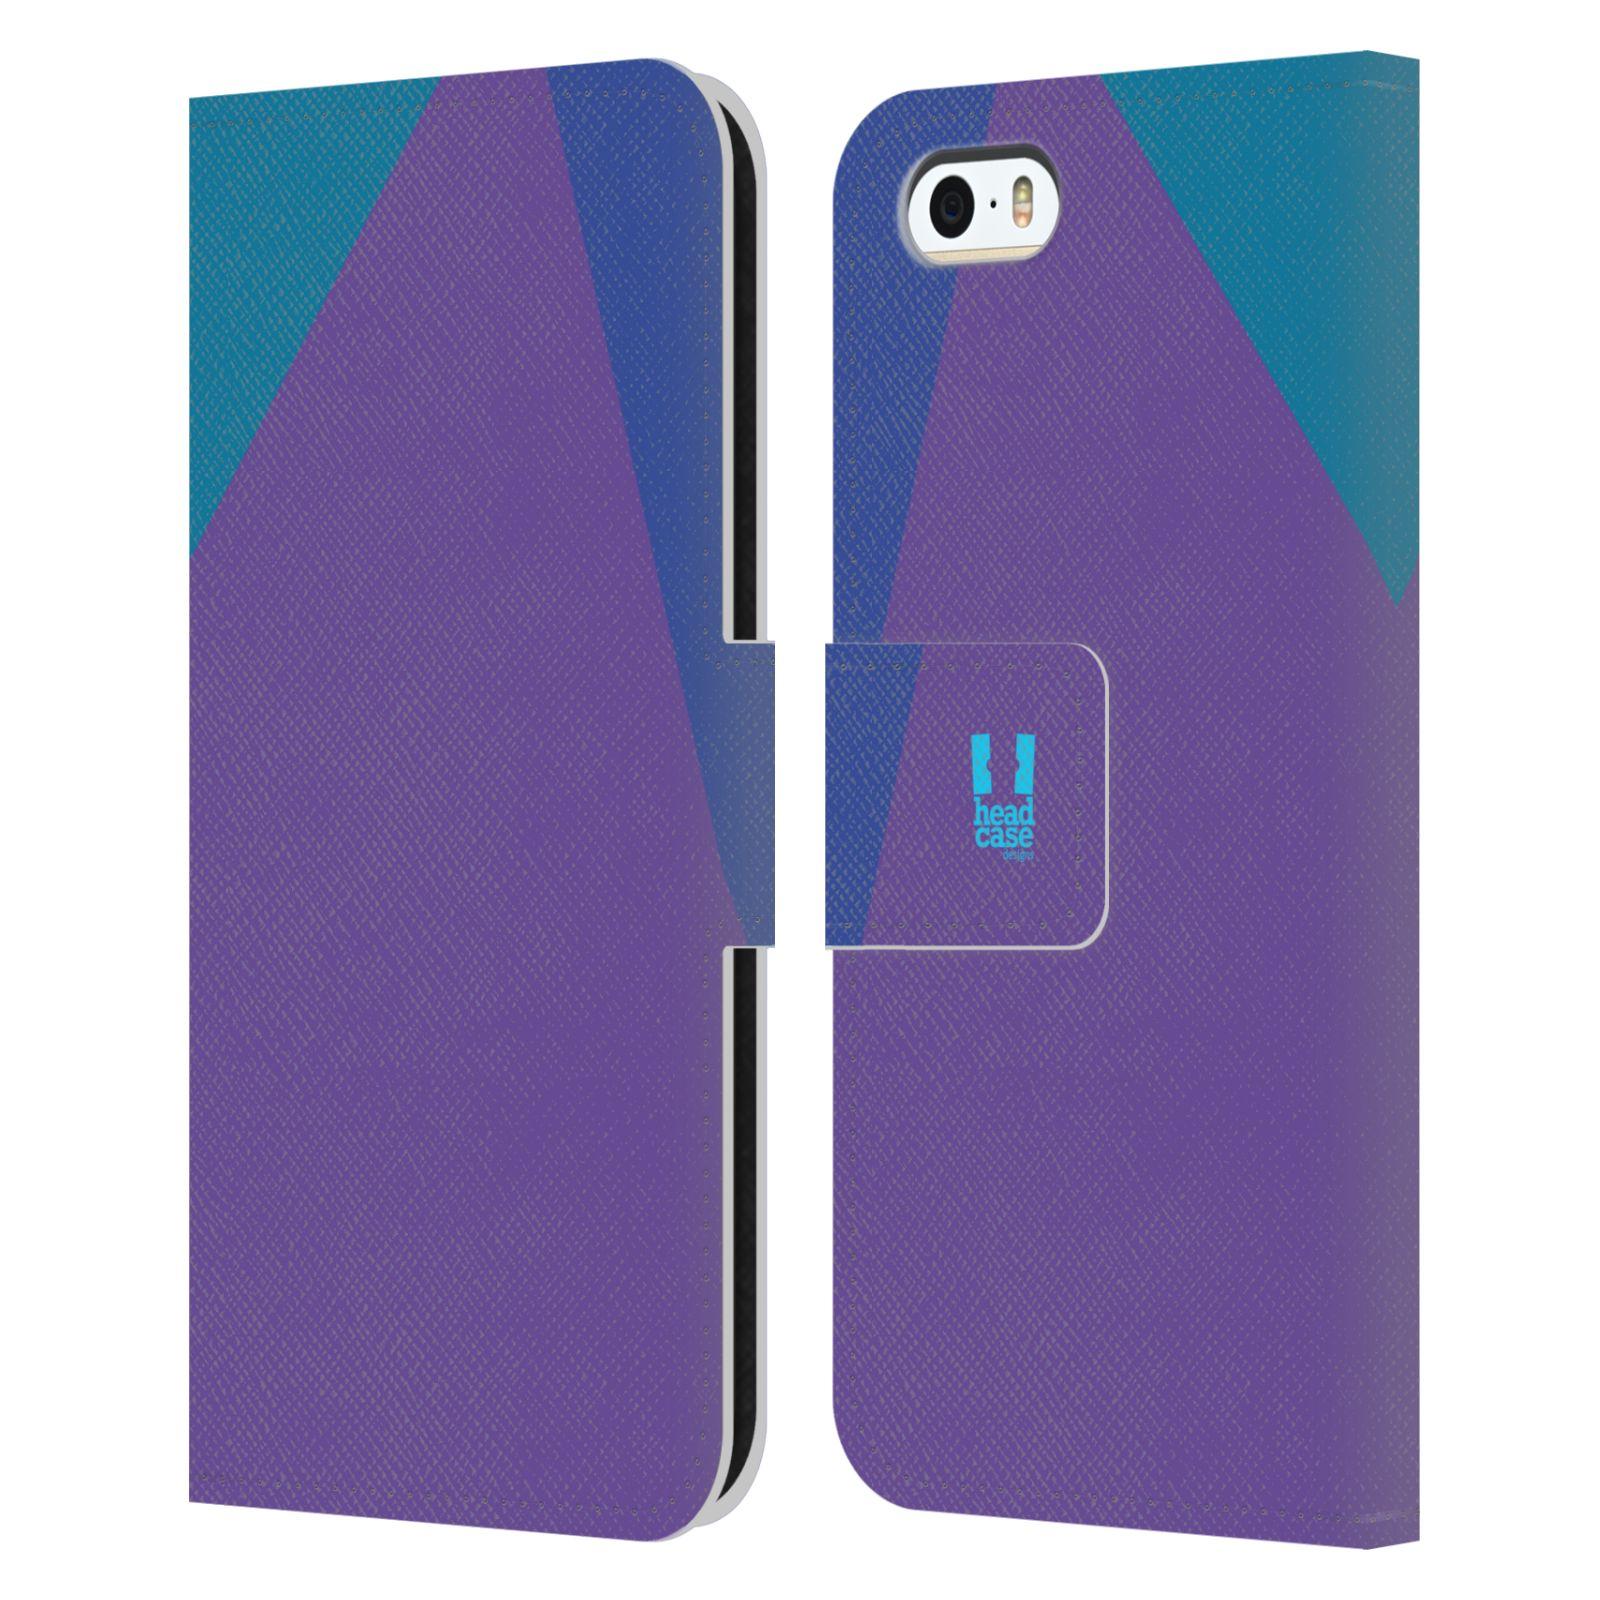 HEAD CASE Flipové pouzdro pro mobil Apple Iphone 5/5S barevné tvary fialová feminine